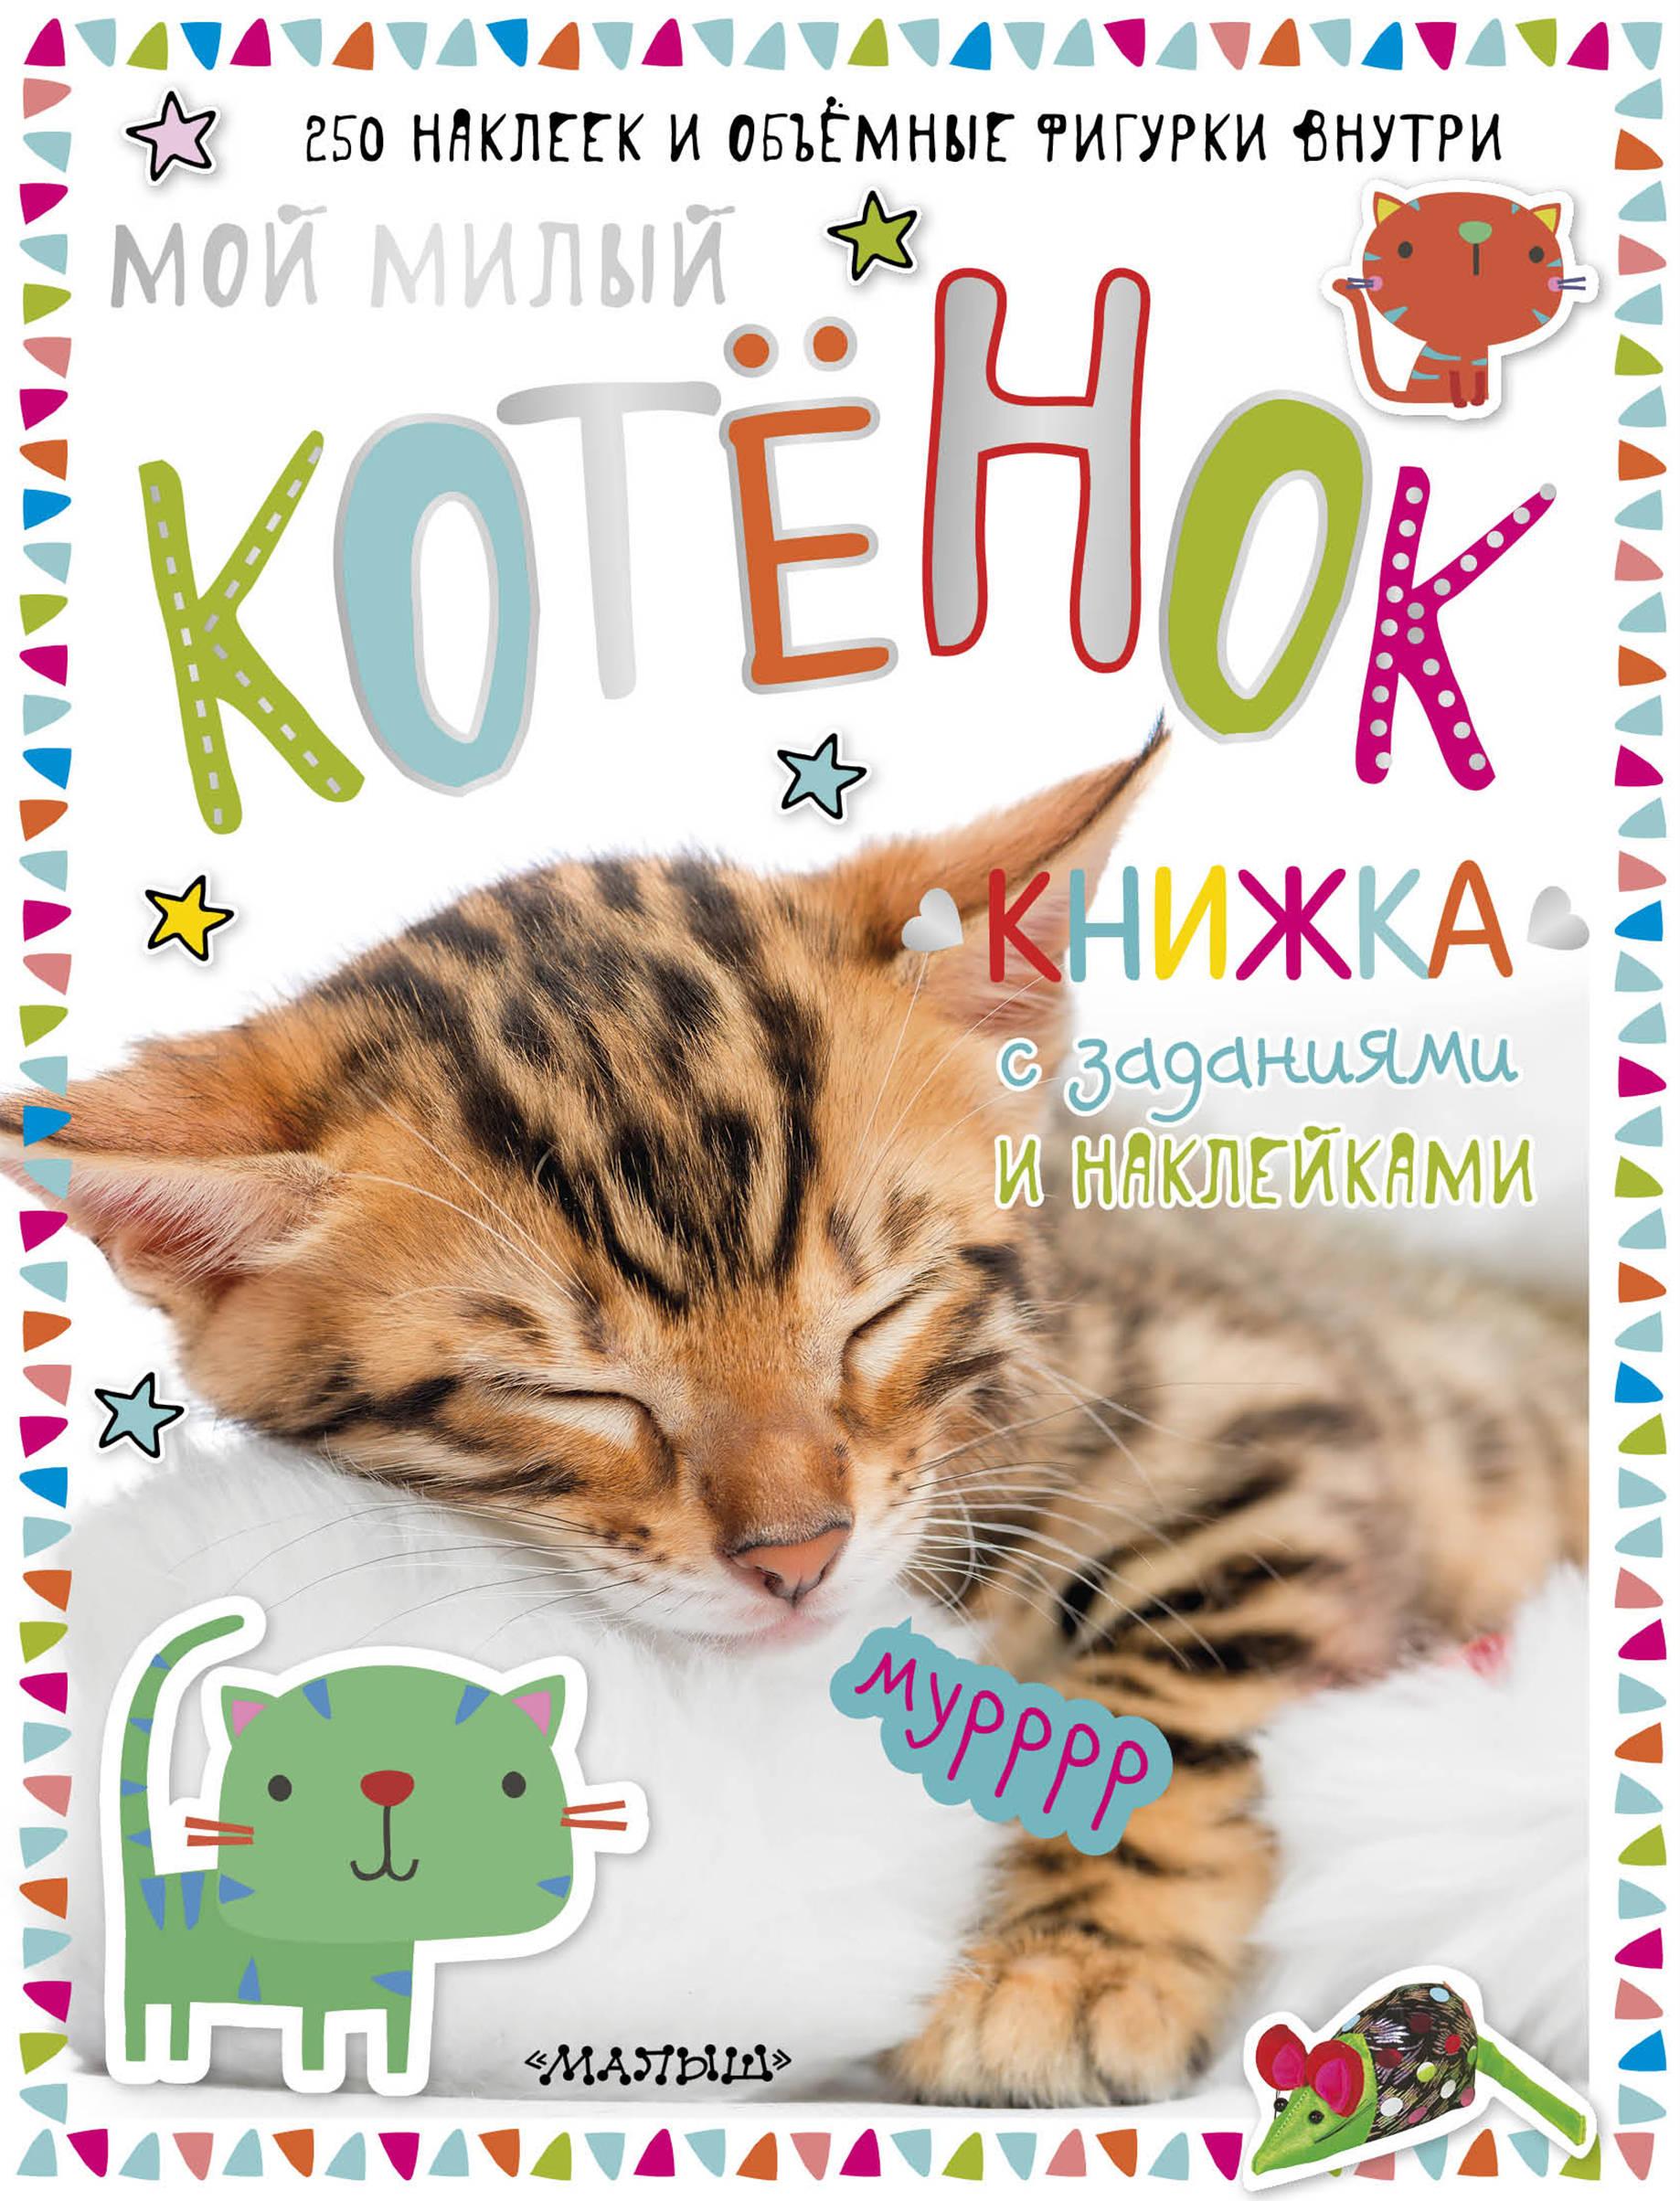 Мой милый котенок